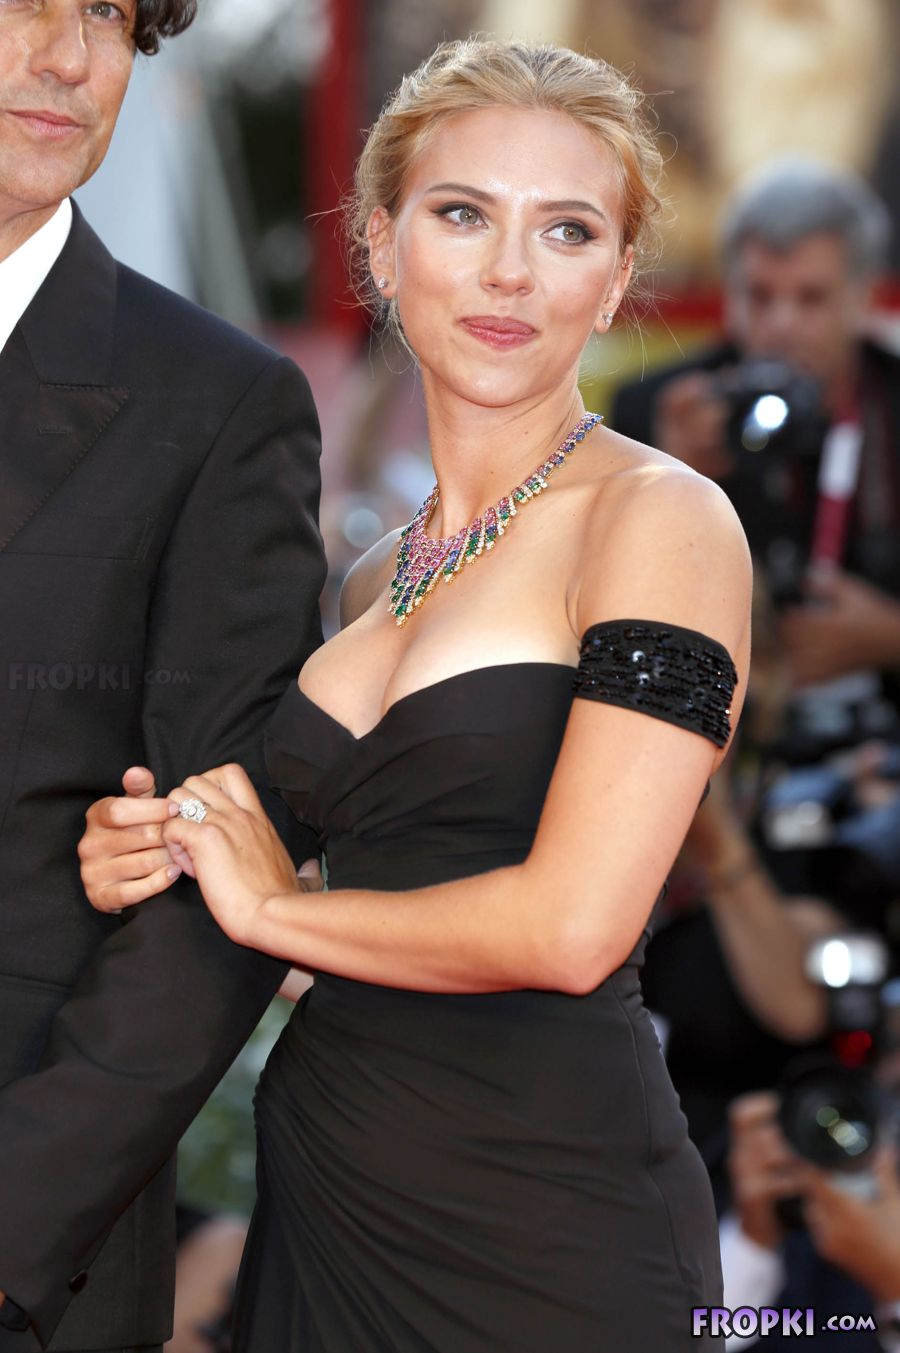 Scarlett Johansson Fropki 05